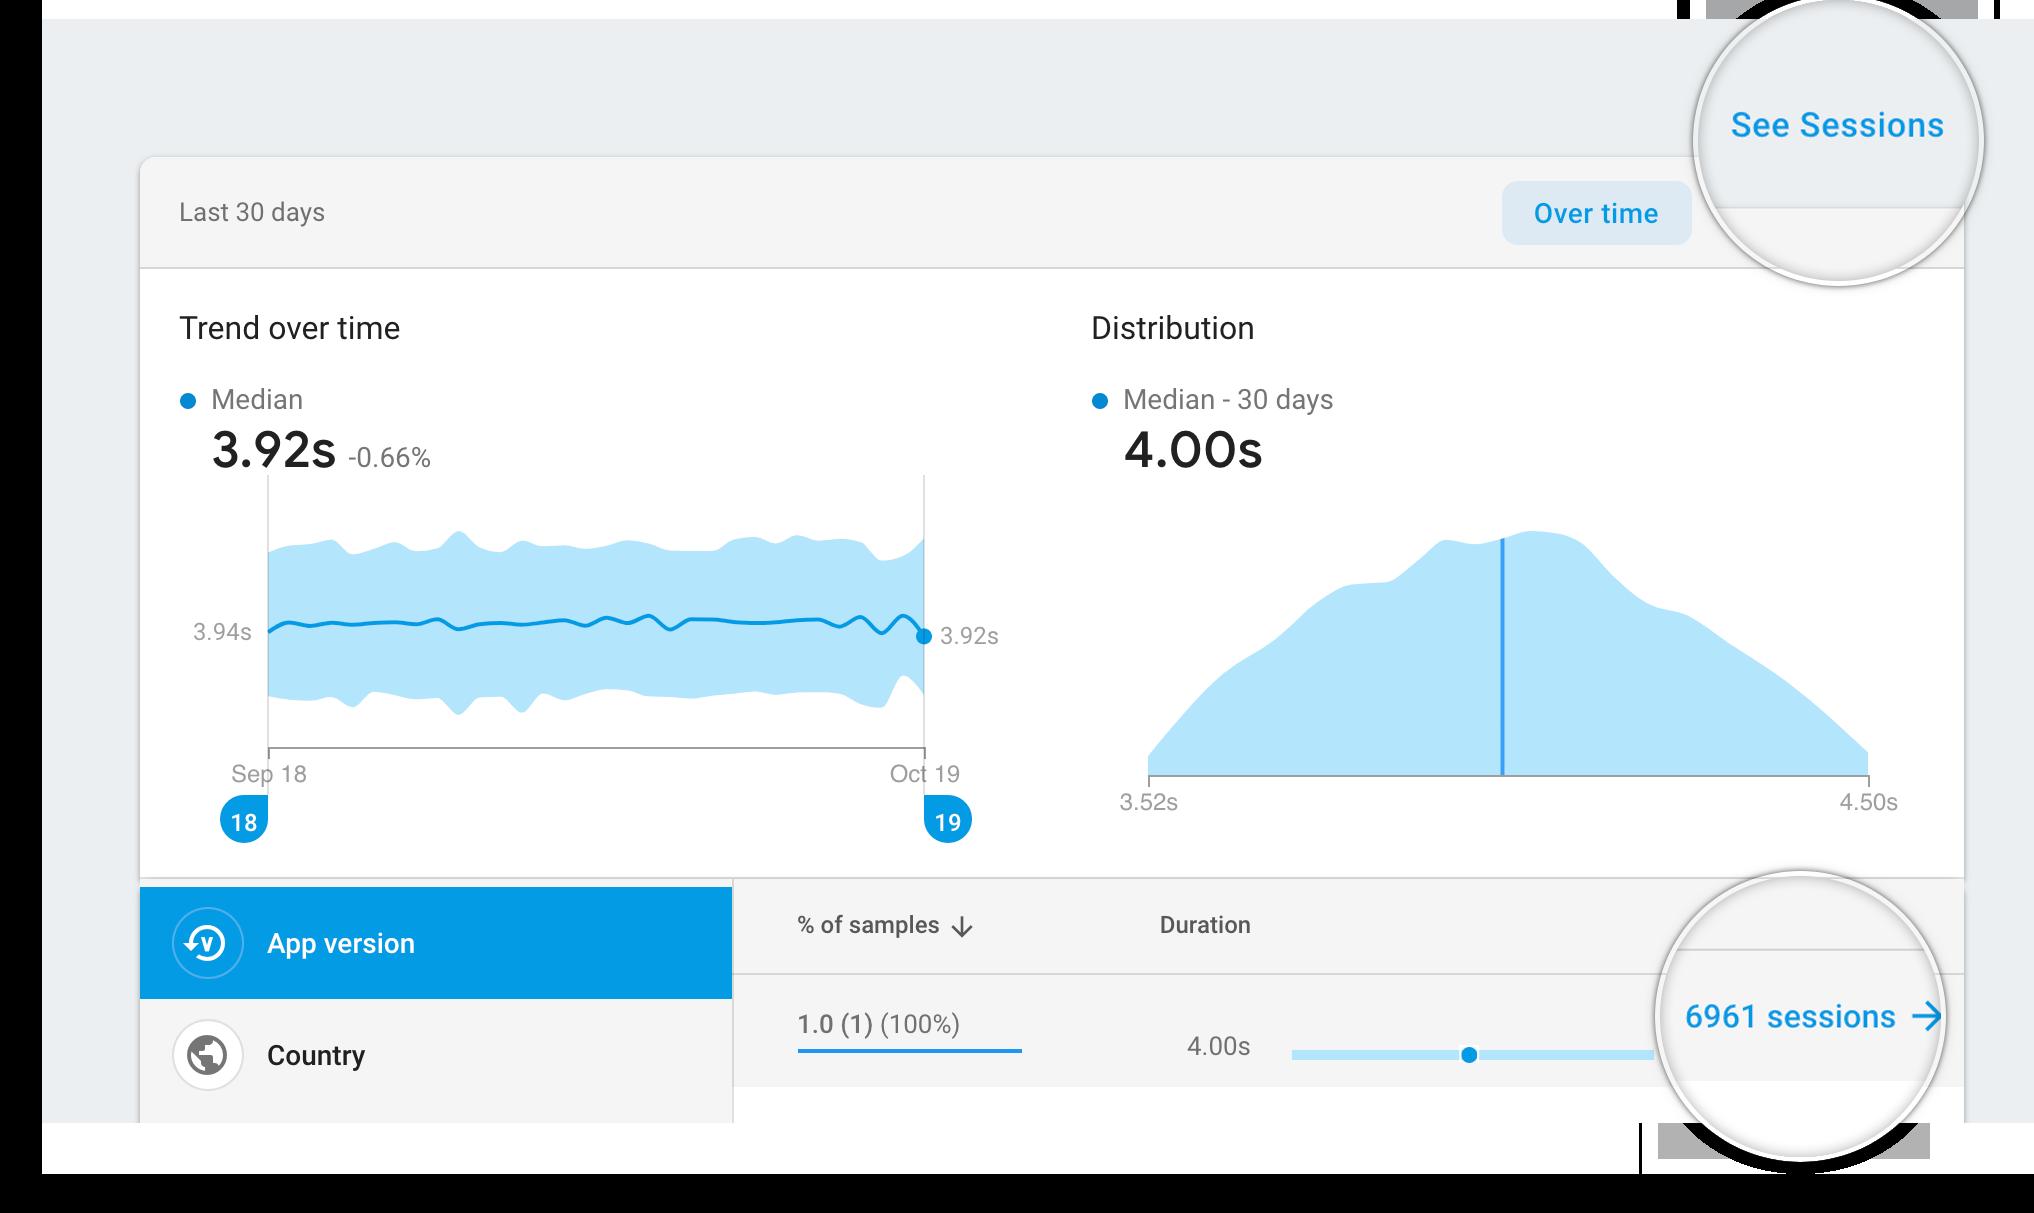 Firebase Performance Monitoring跟踪的图像,其中包含指向会话的链接